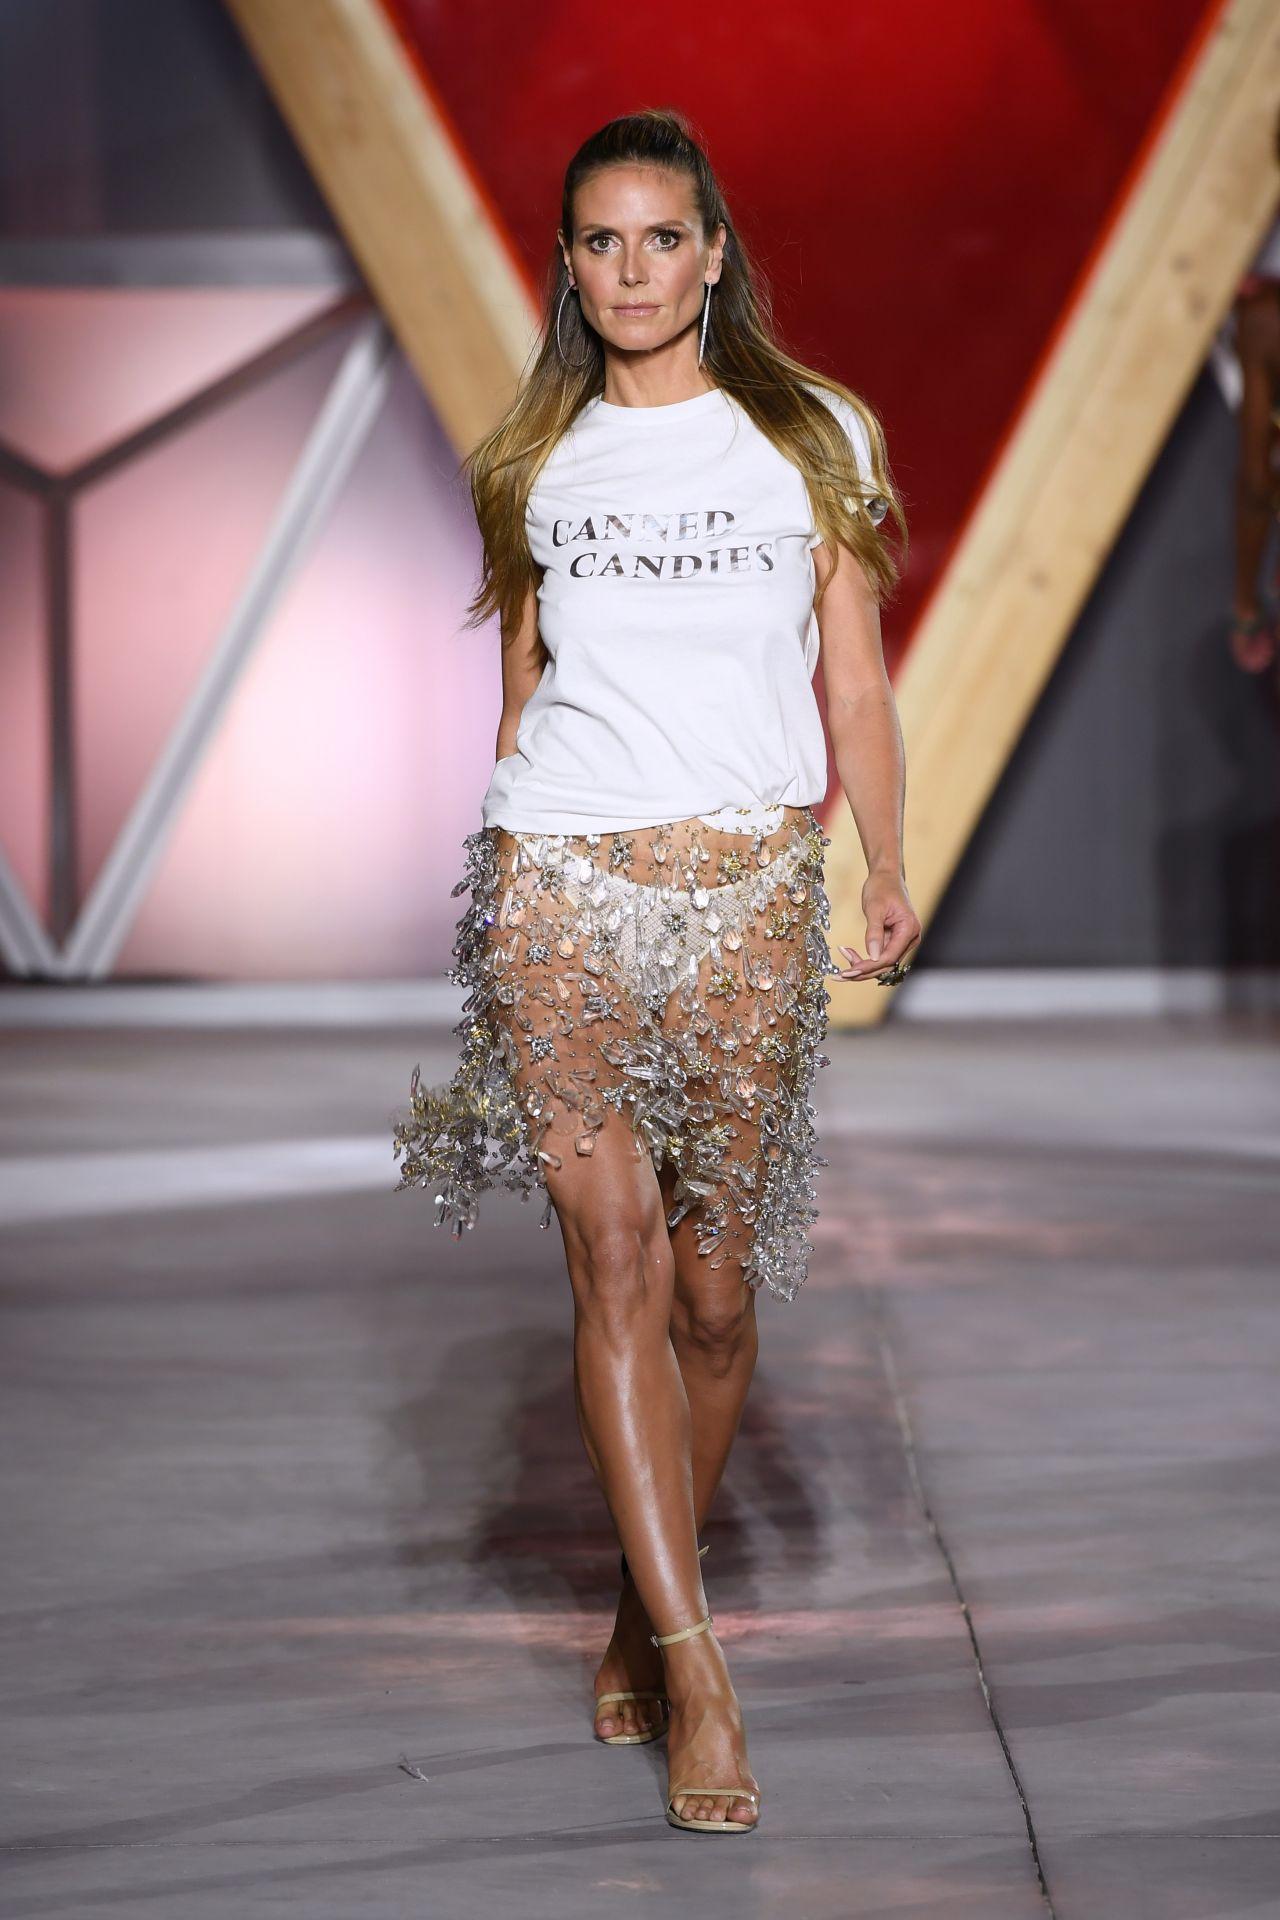 Heidi Klum Fashion For Relief At Cannes Film Festival 05